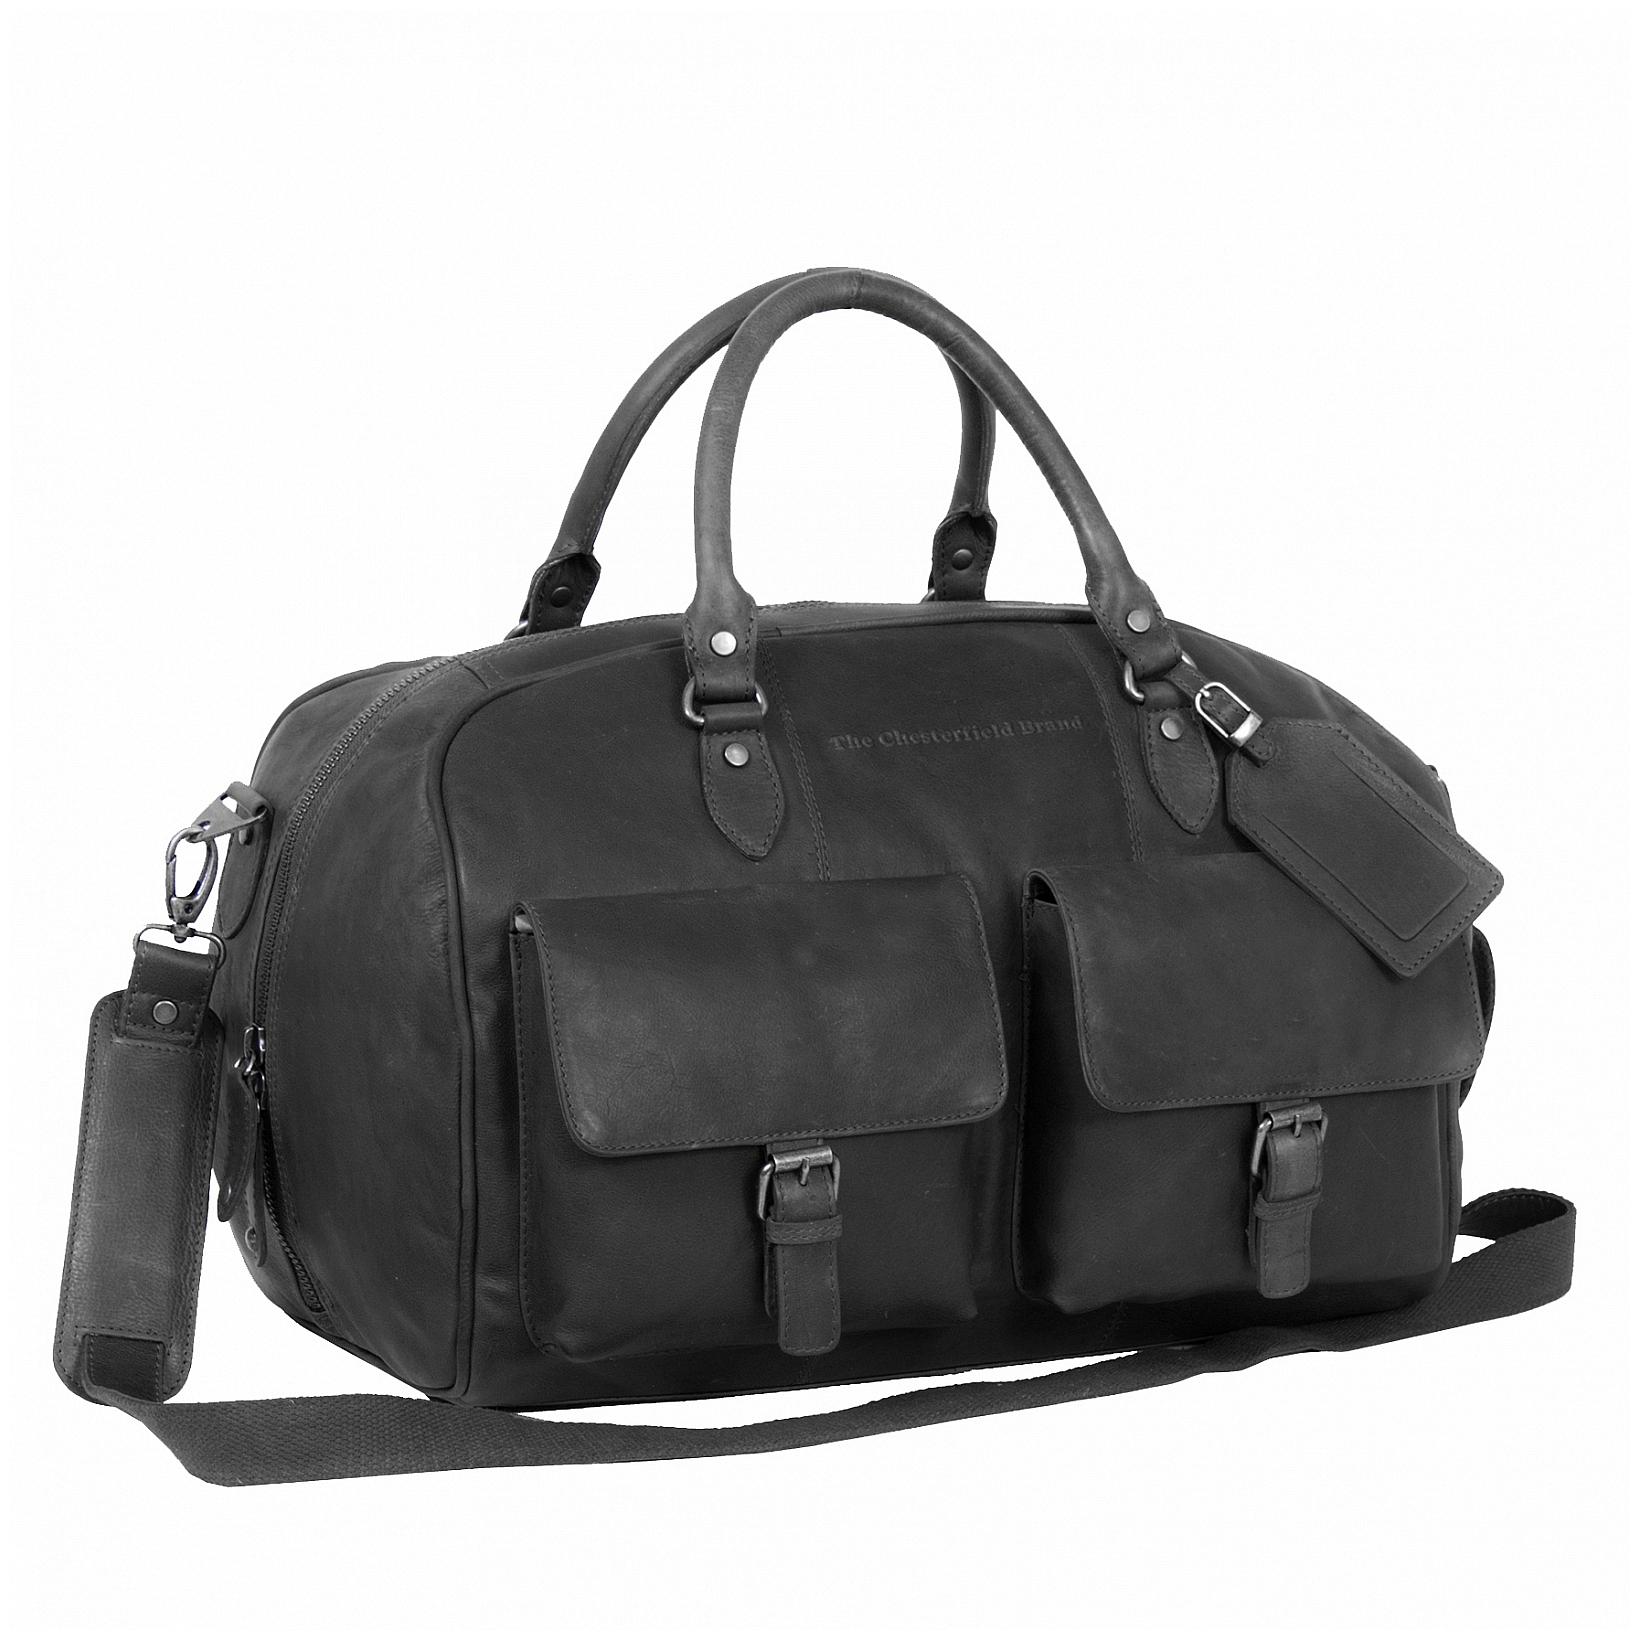 The Chesterfield Brand Kožená cestovní taška - weekender C20.001500 Wyatt černá